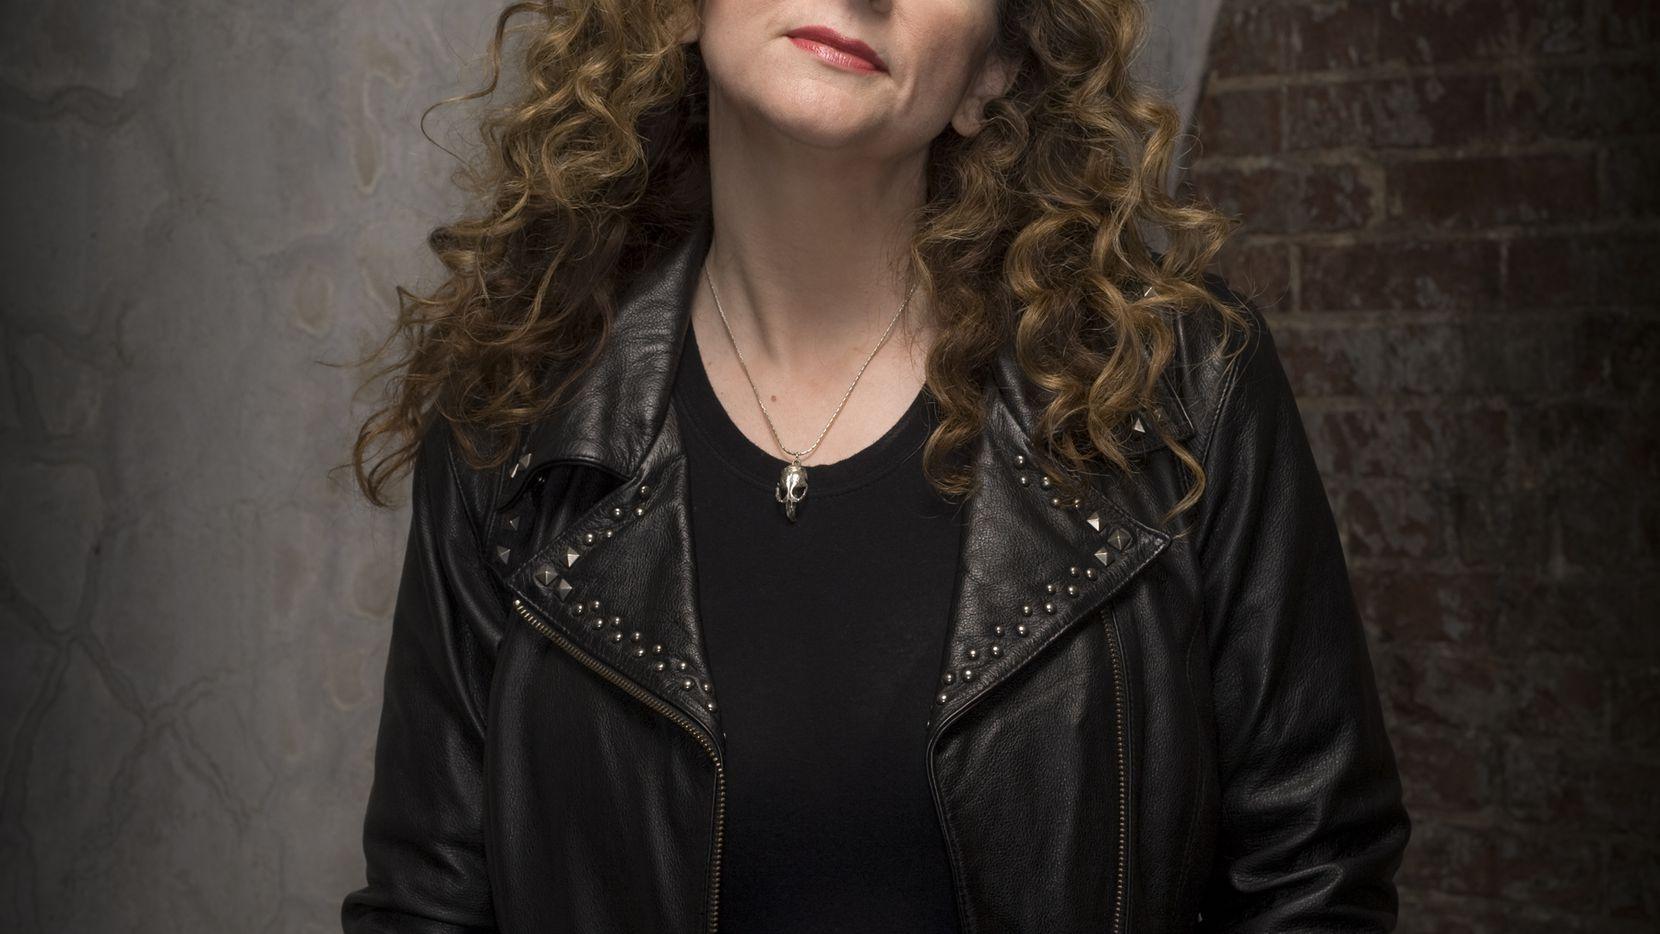 Author Laurell K. Hamilton